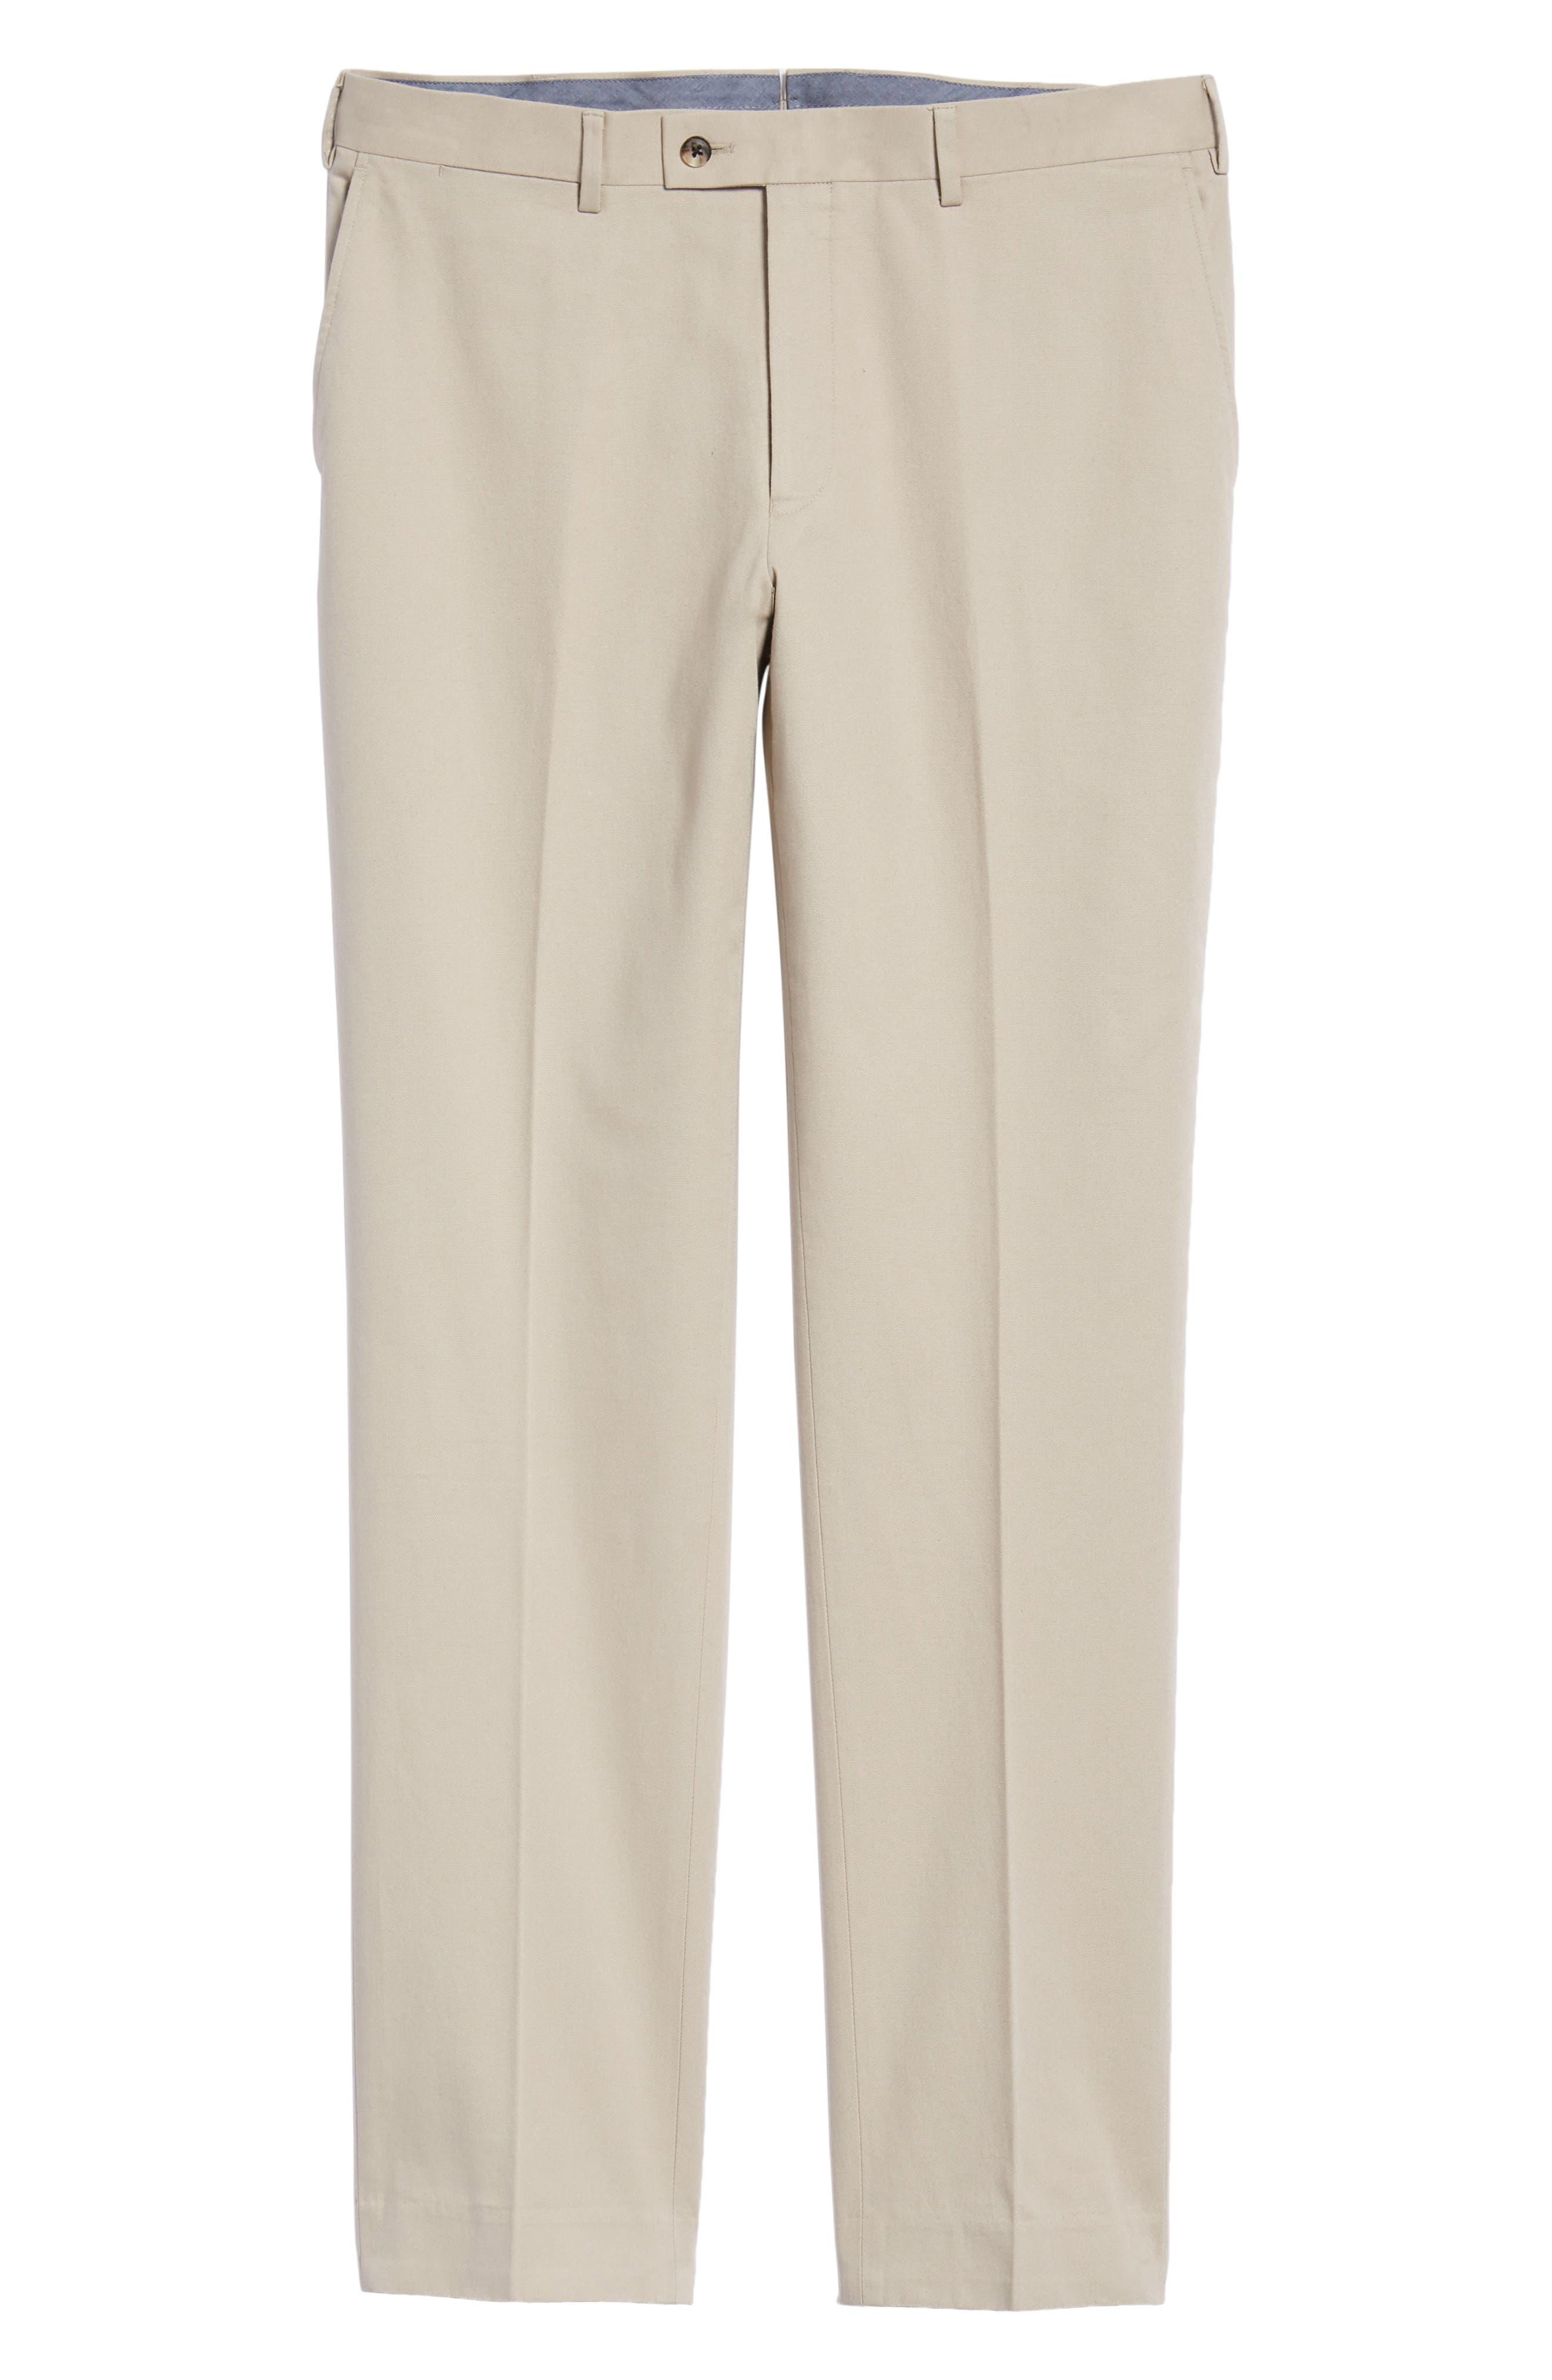 Finchley Regular Fit Pants,                             Alternate thumbnail 6, color,                             102